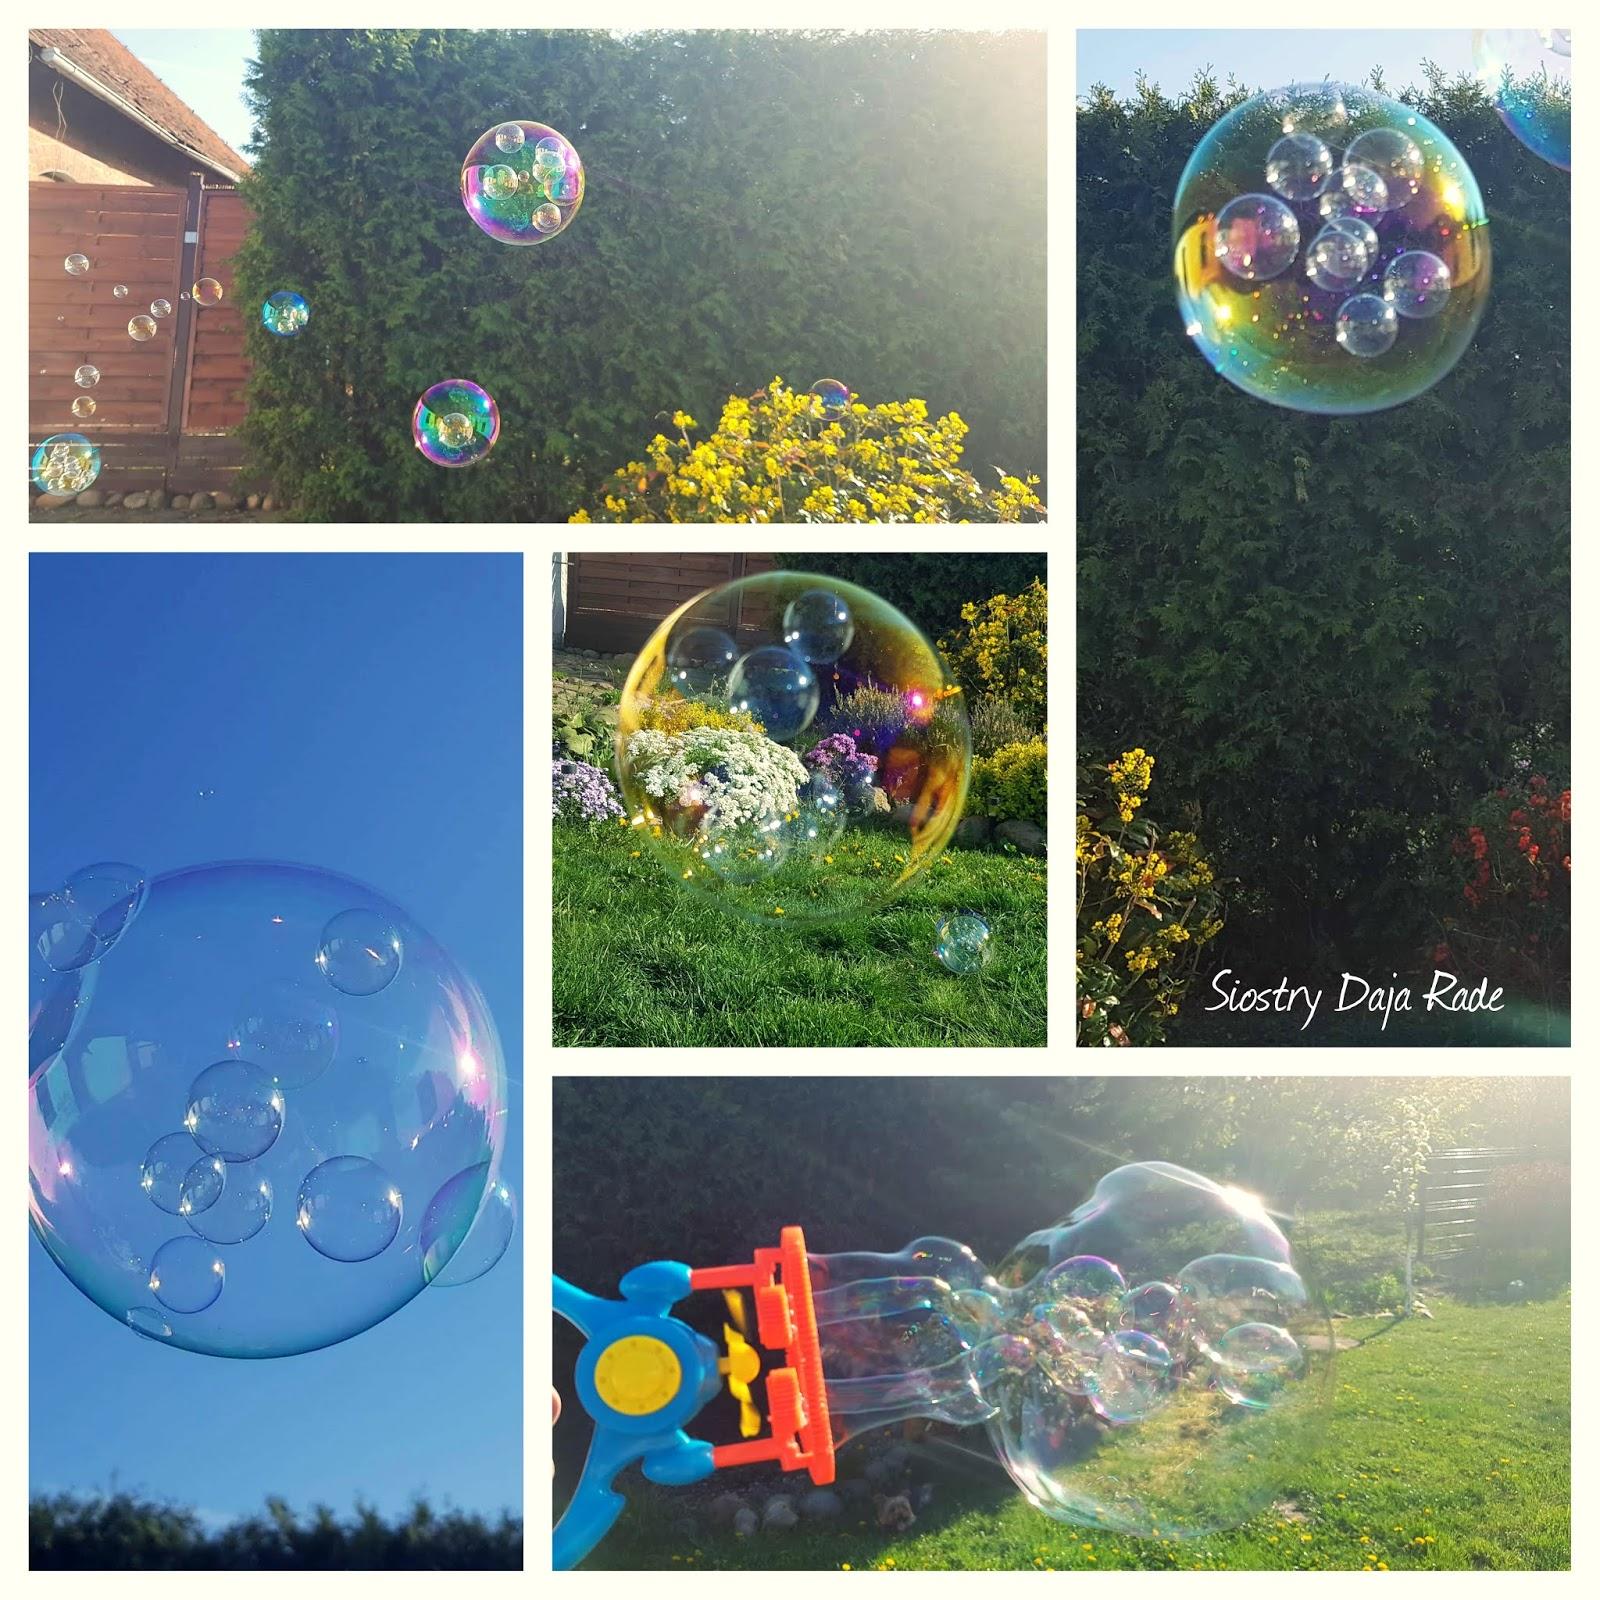 013ffeb818 Bańki My Bubble są kolorowe